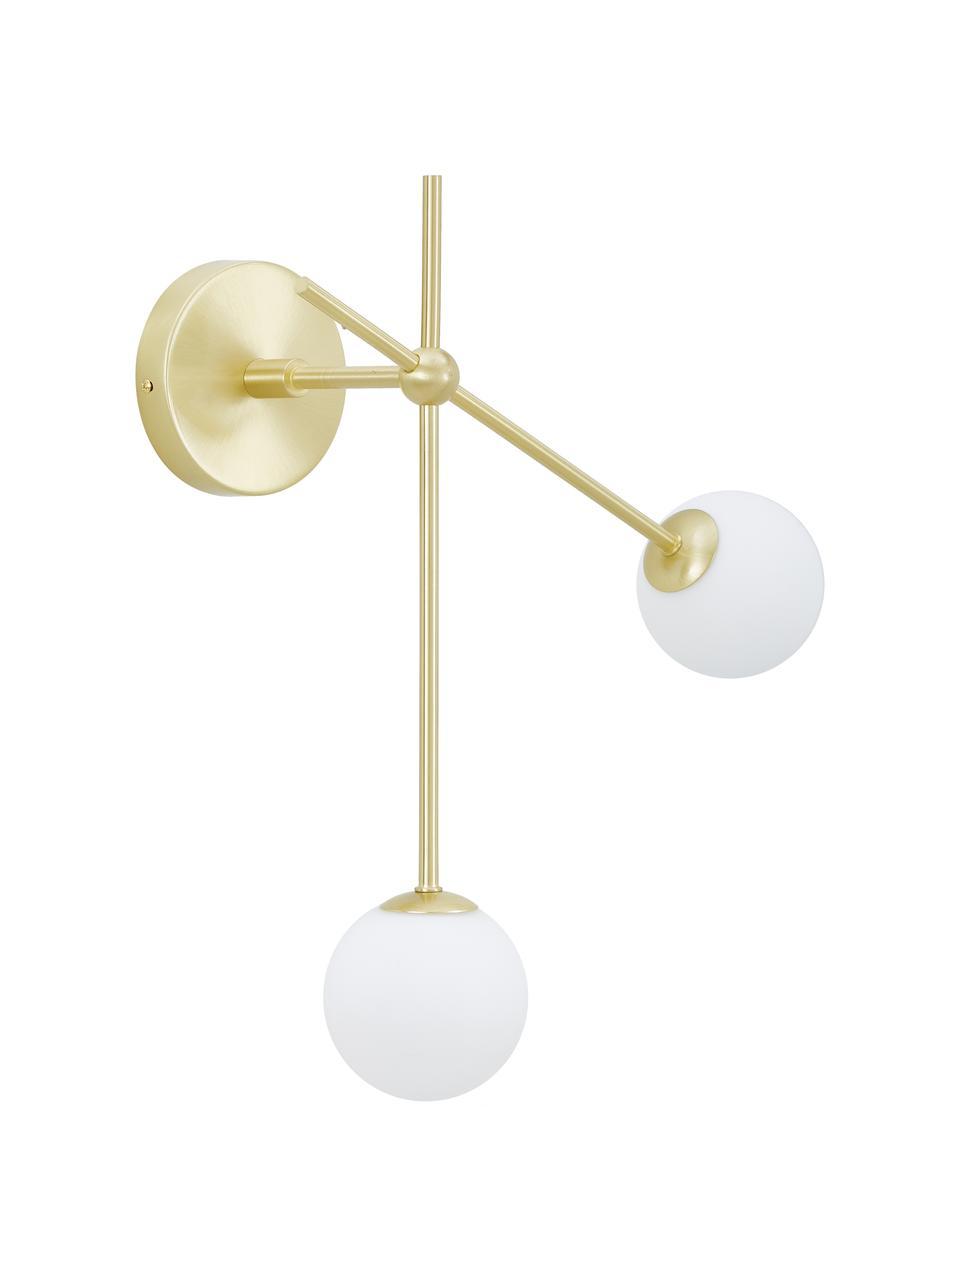 Applique Moon, Paralume: vetro, Baldacchino e rilegatura: ottone spazzolat paralume: bianco cavo: nero, Larg. 39 x Prof. 20 cm